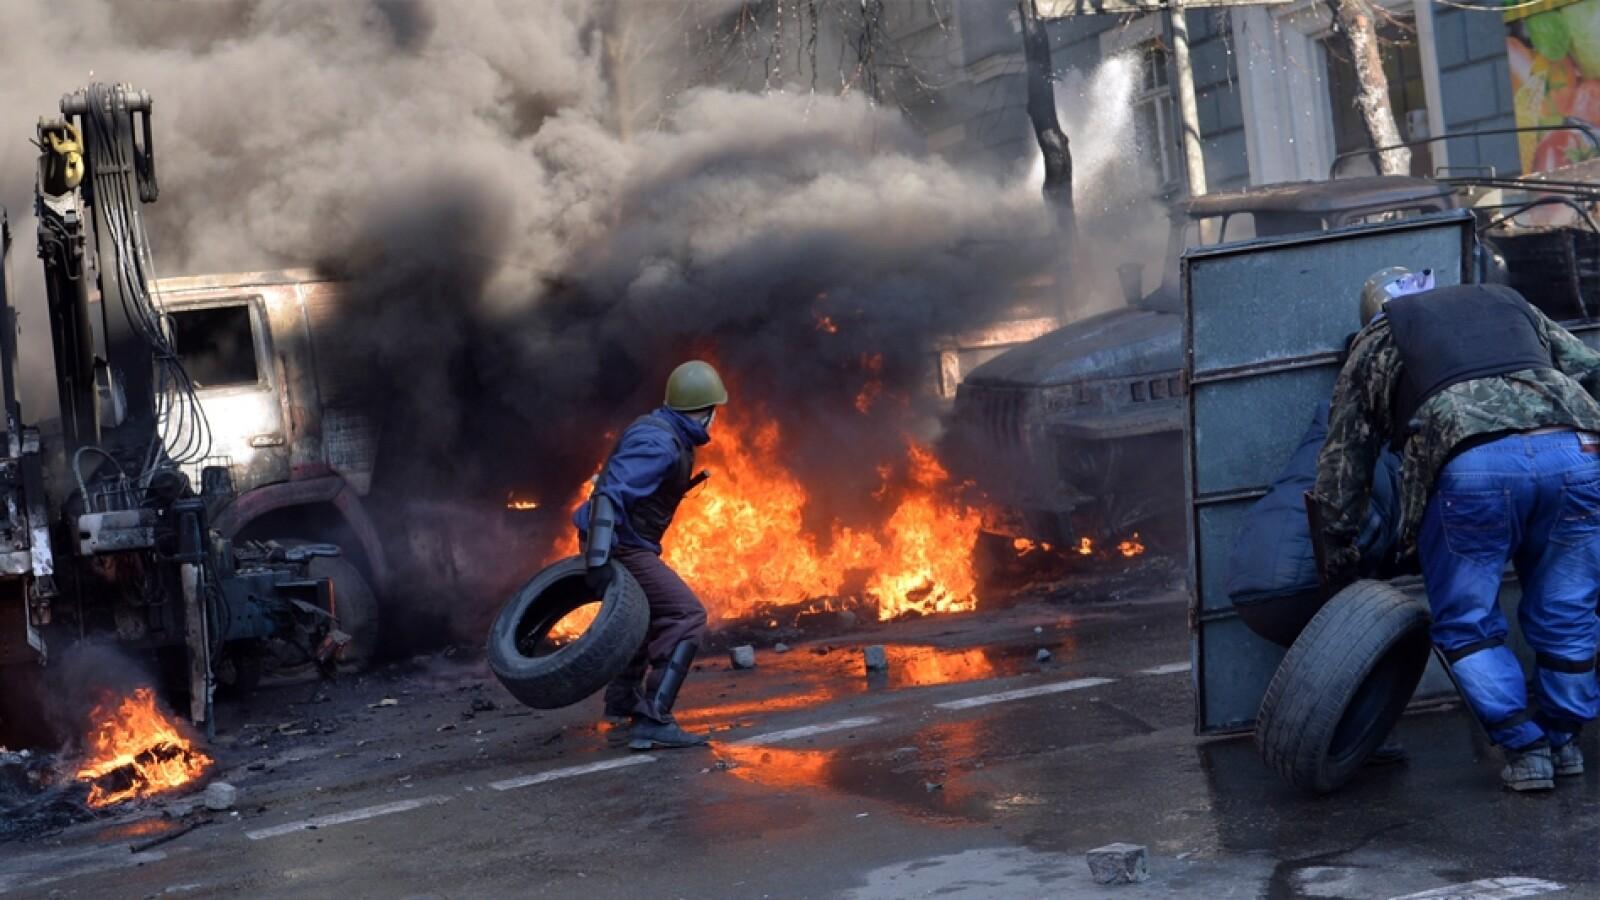 AFP ucrania, protestas 3